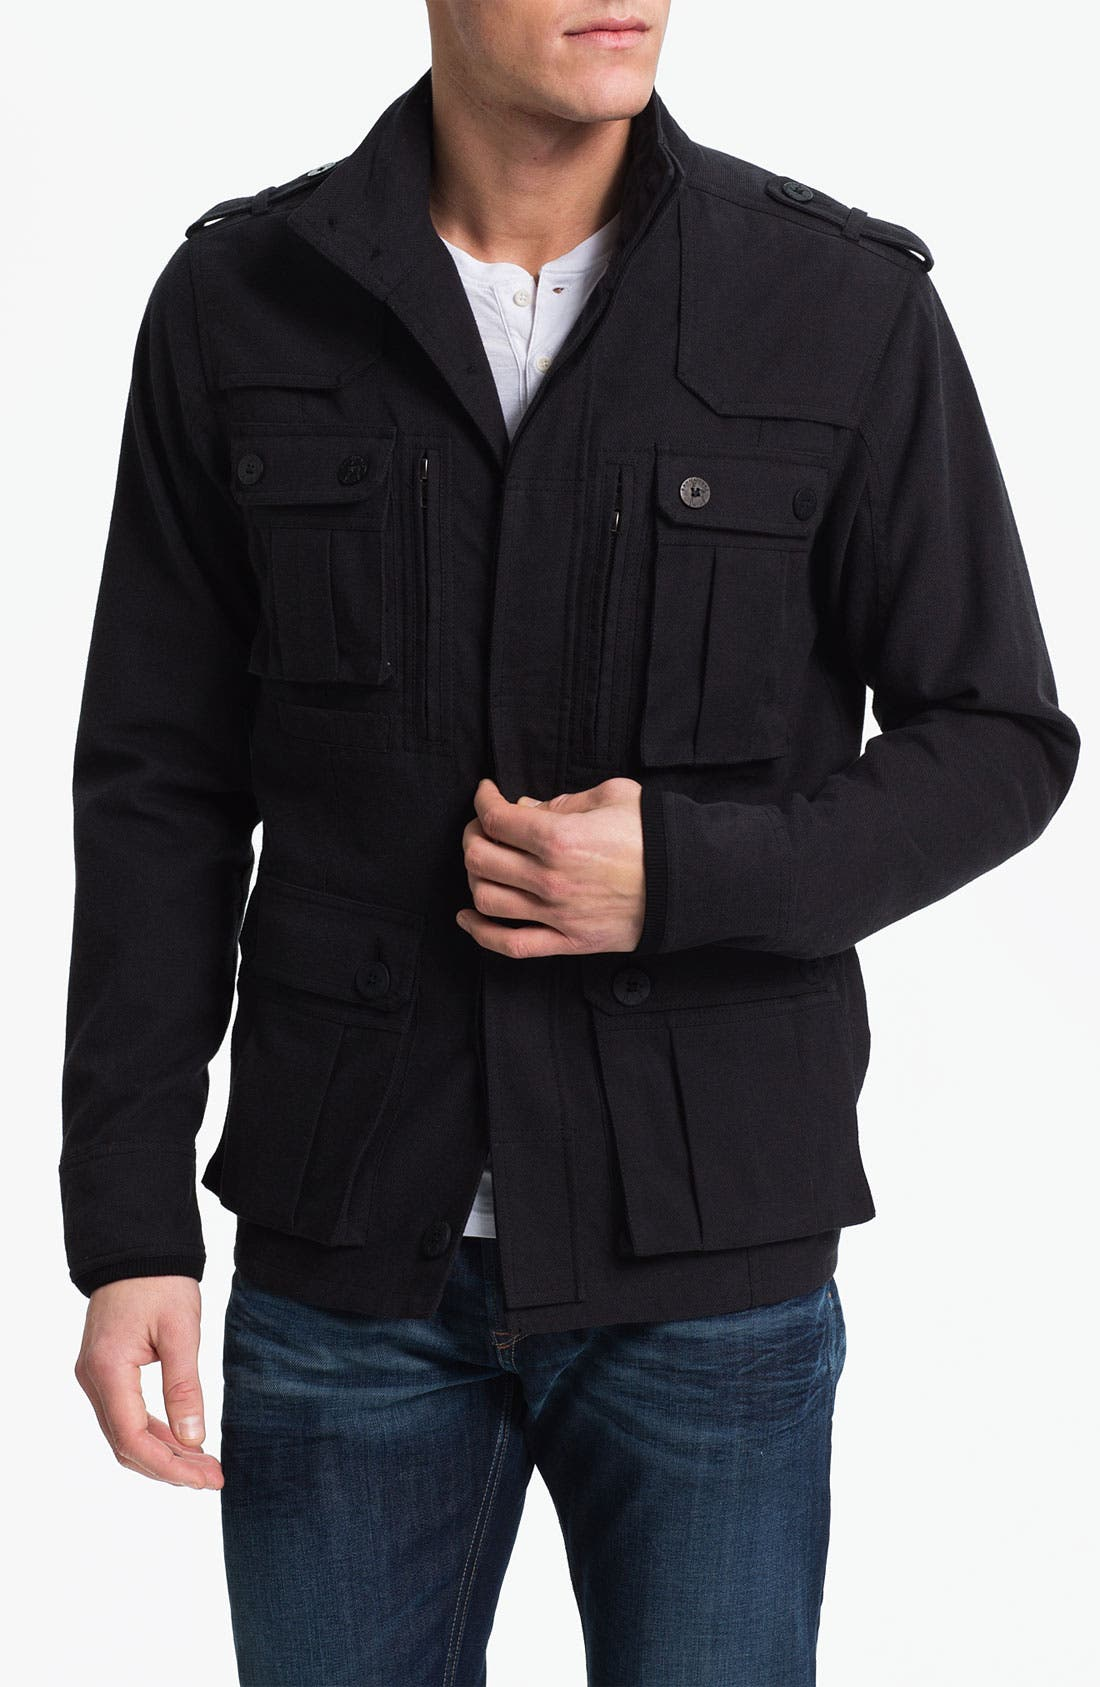 Alternate Image 1 Selected - Kane & Unke Cotton Twill Field Jacket